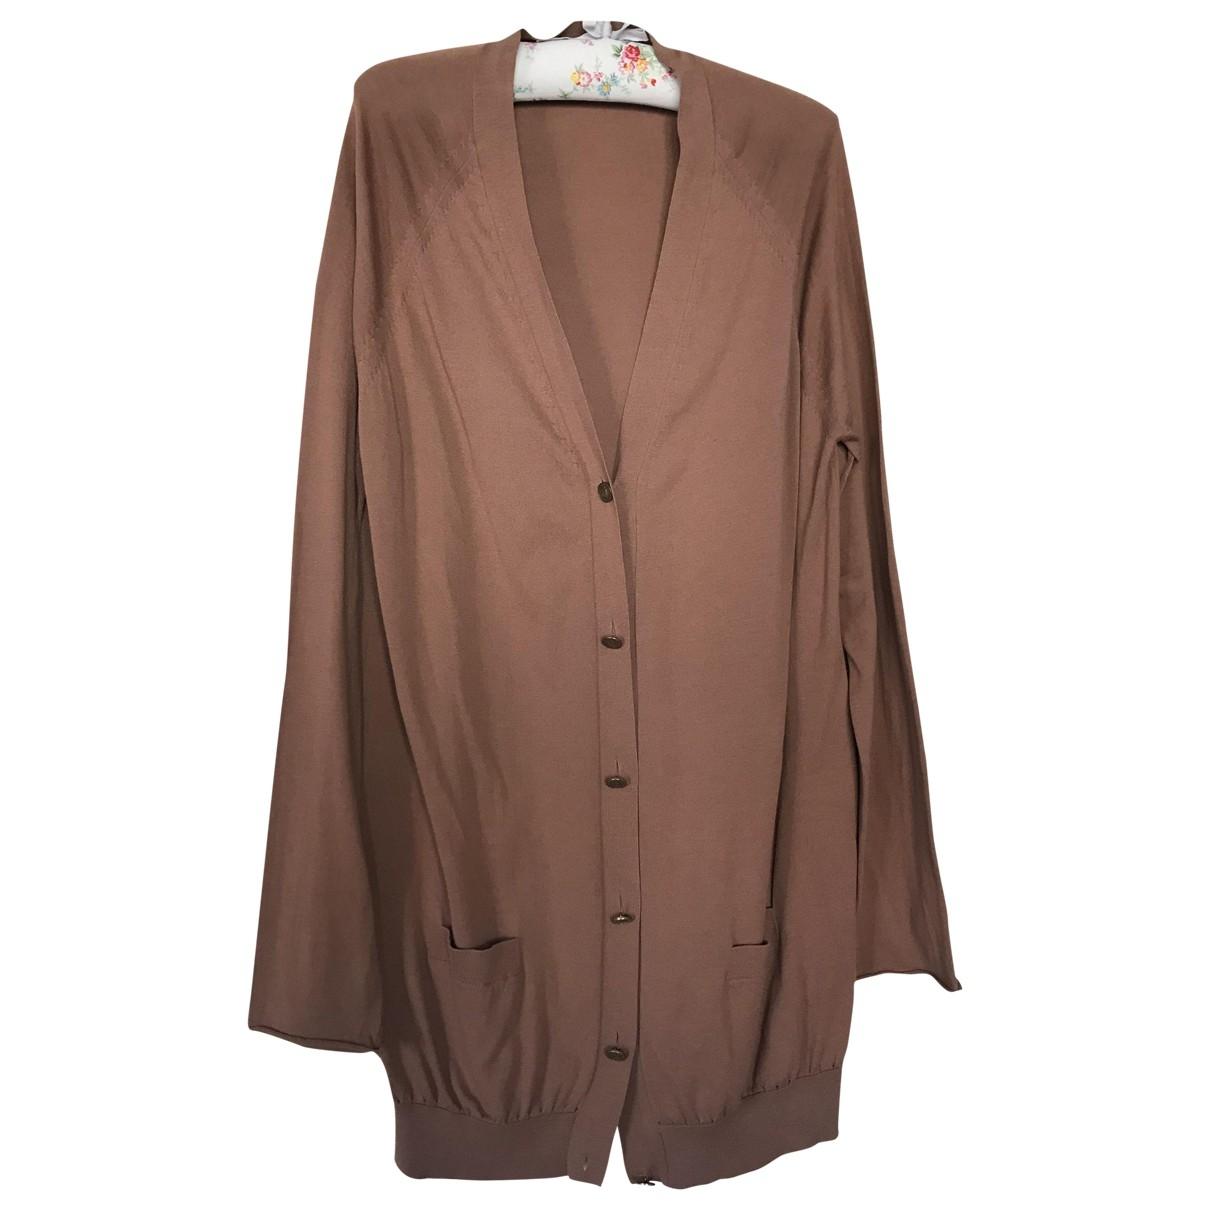 Lanvin \N Cotton jacket for Women L International